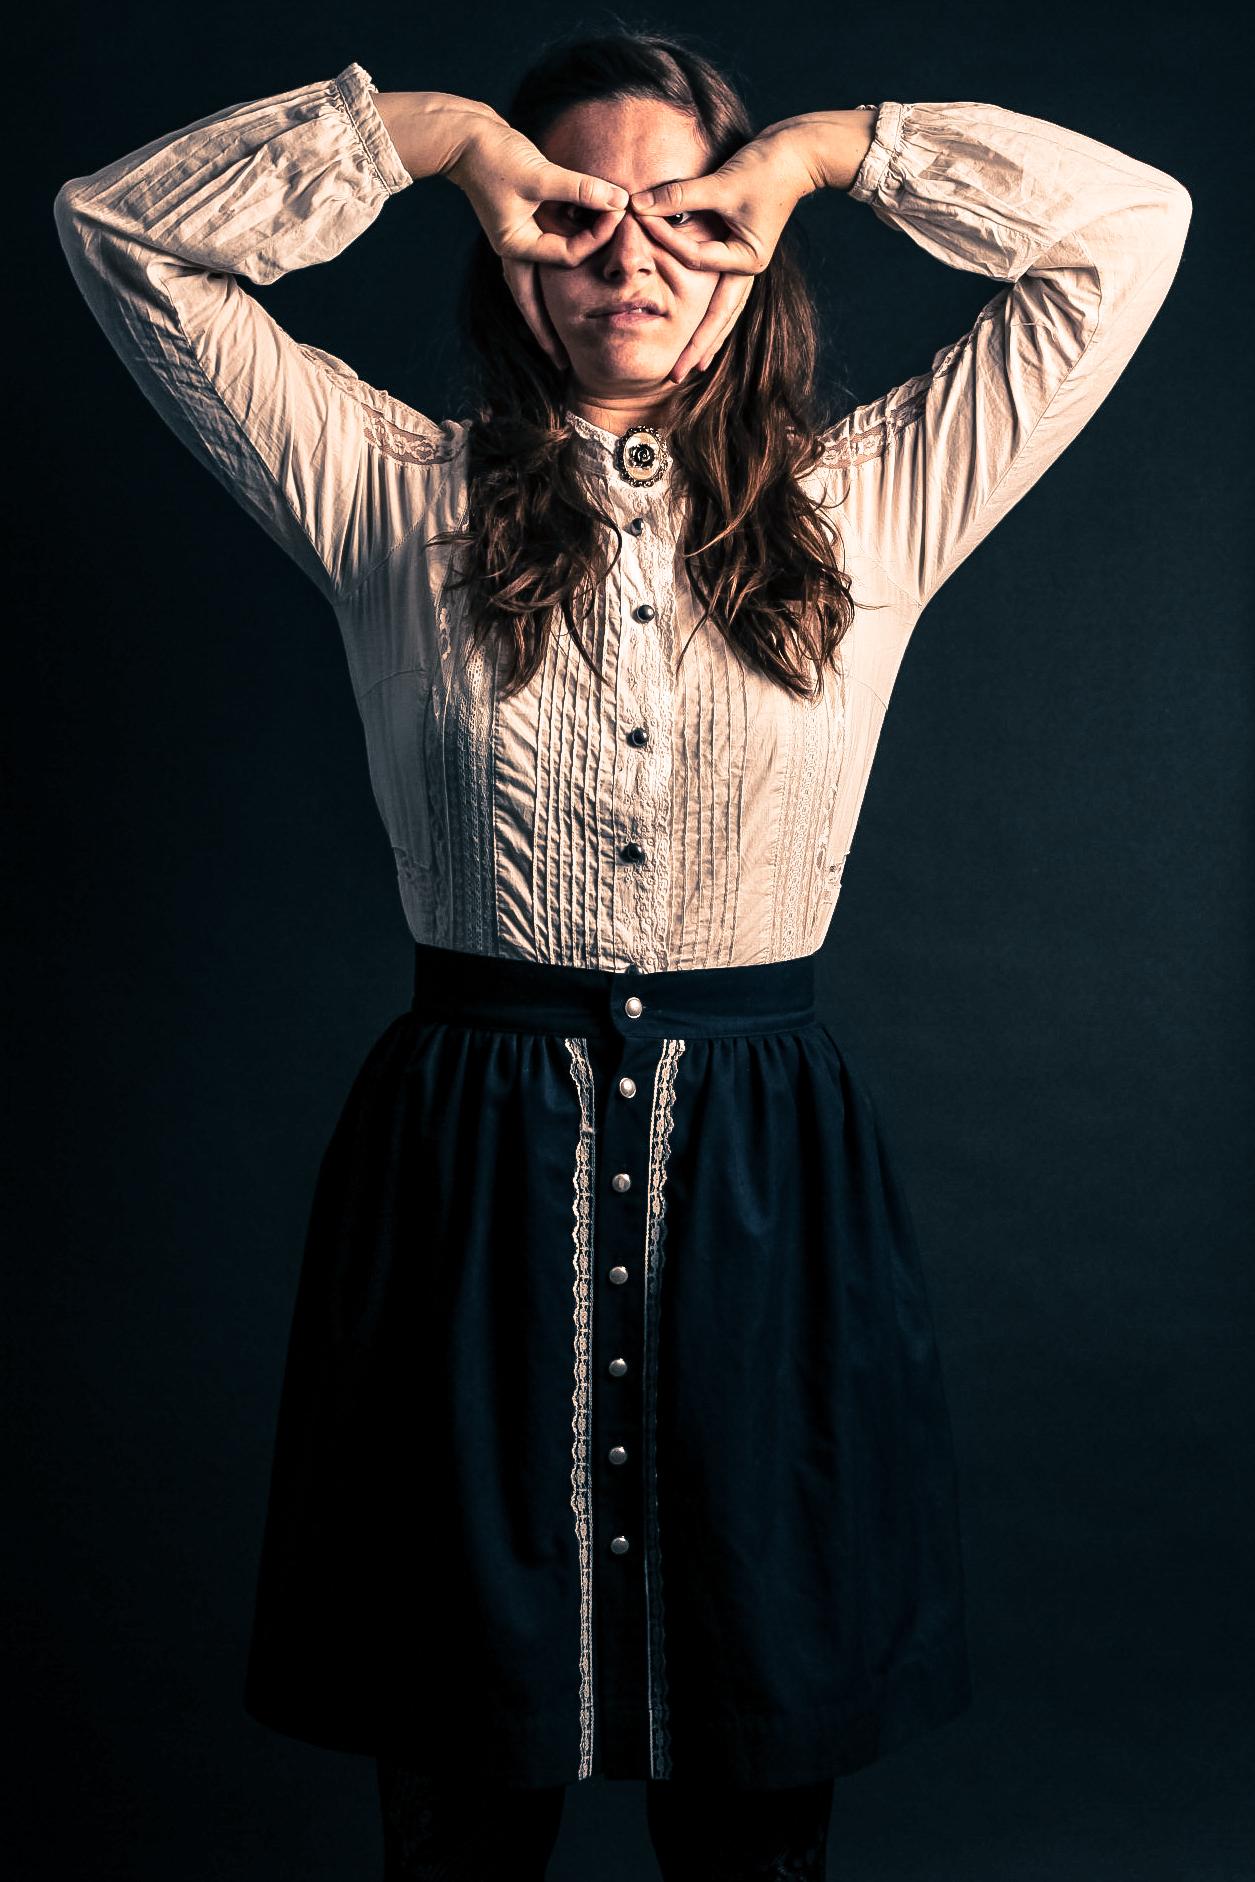 Jenny Nilsson @ Bian Photography glasögon